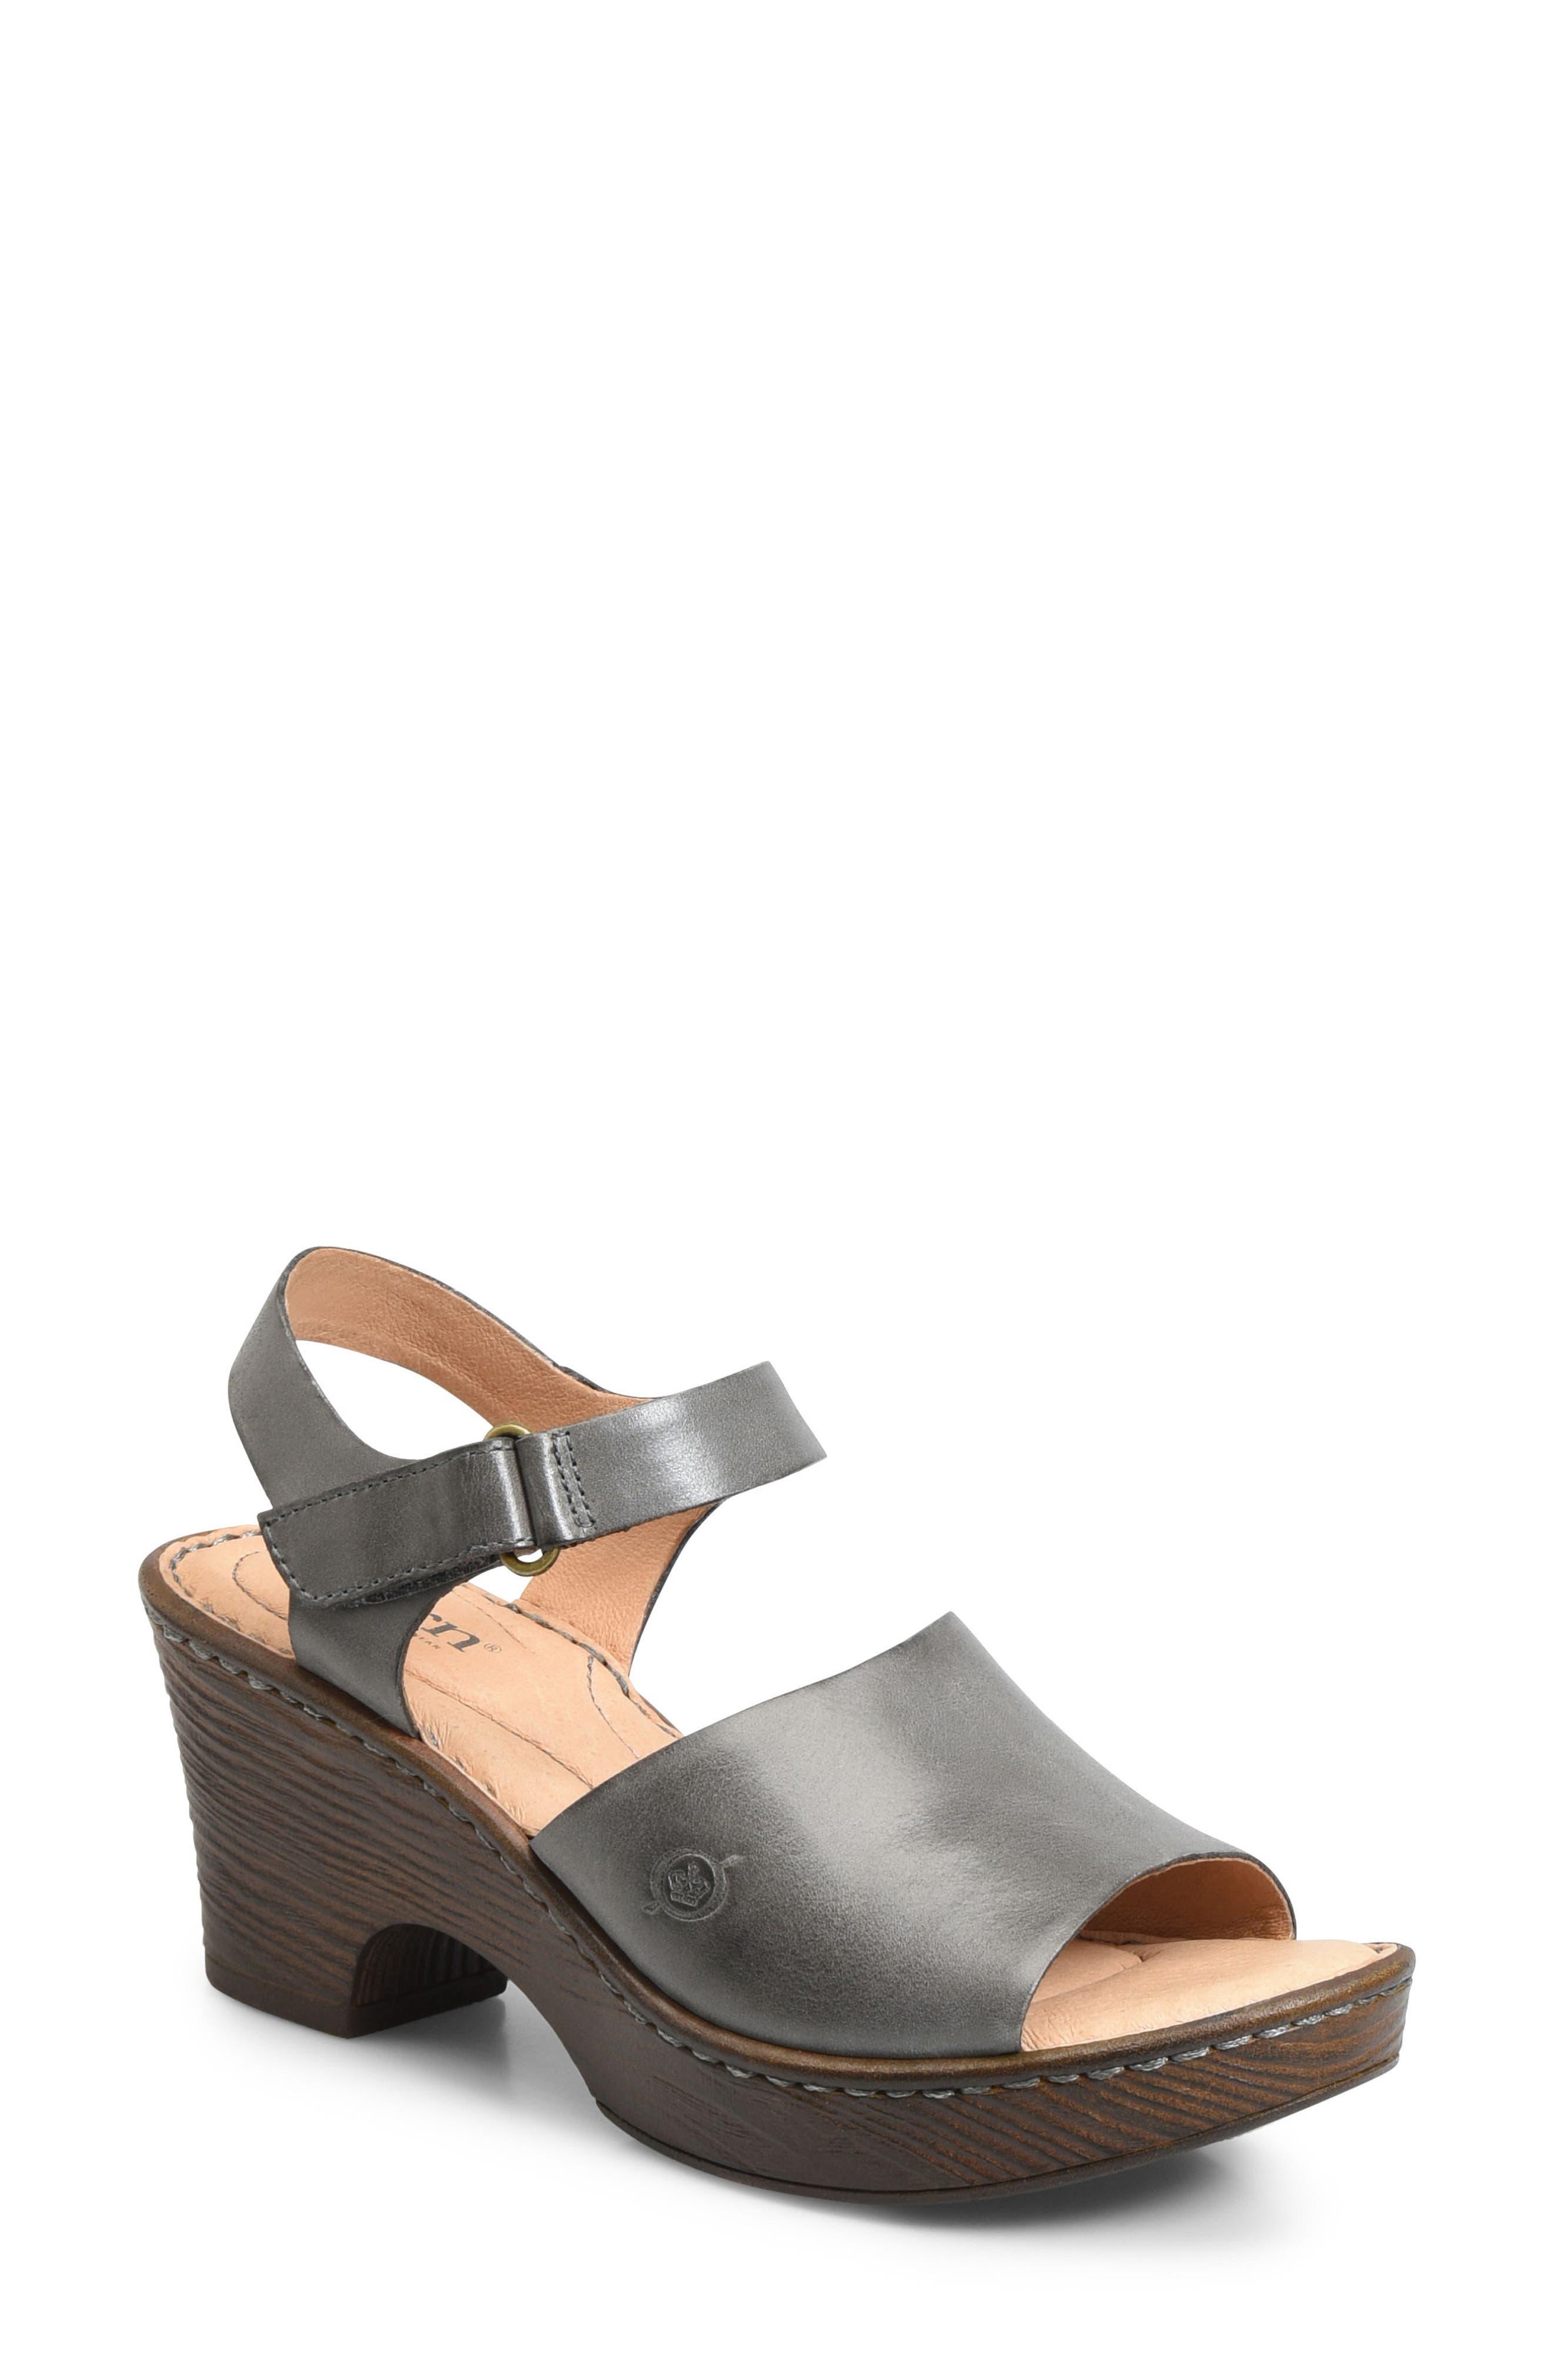 Canna Platform Sandal,                         Main,                         color, Grey Leather